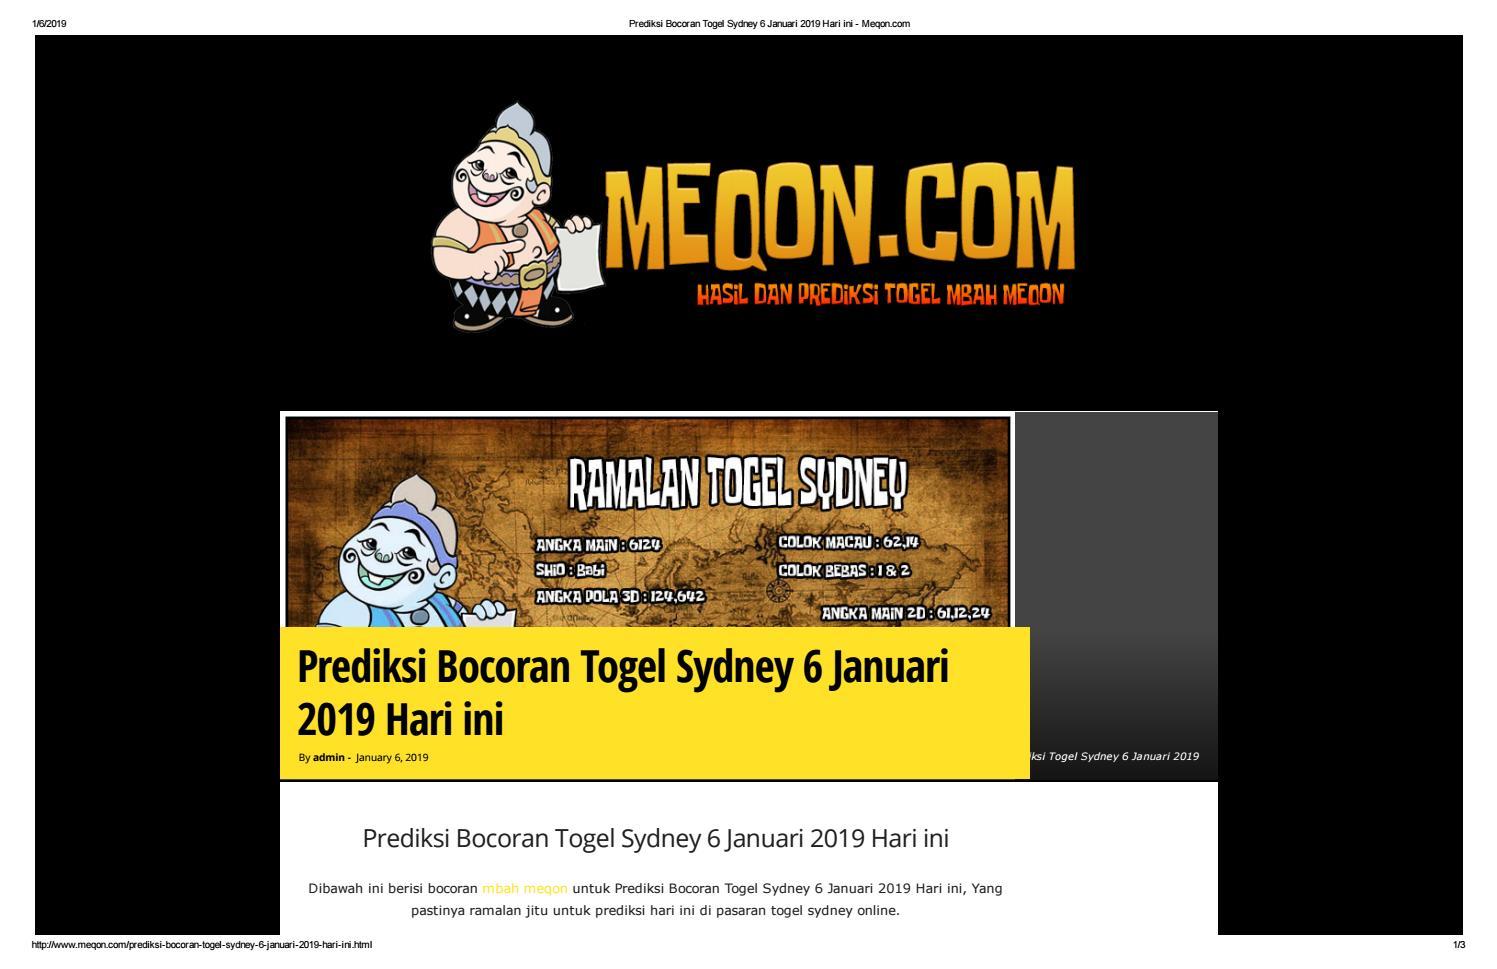 Prediksi Bocoran Togel Sydney 6 Januari 2019 Hari ini - Meqon by